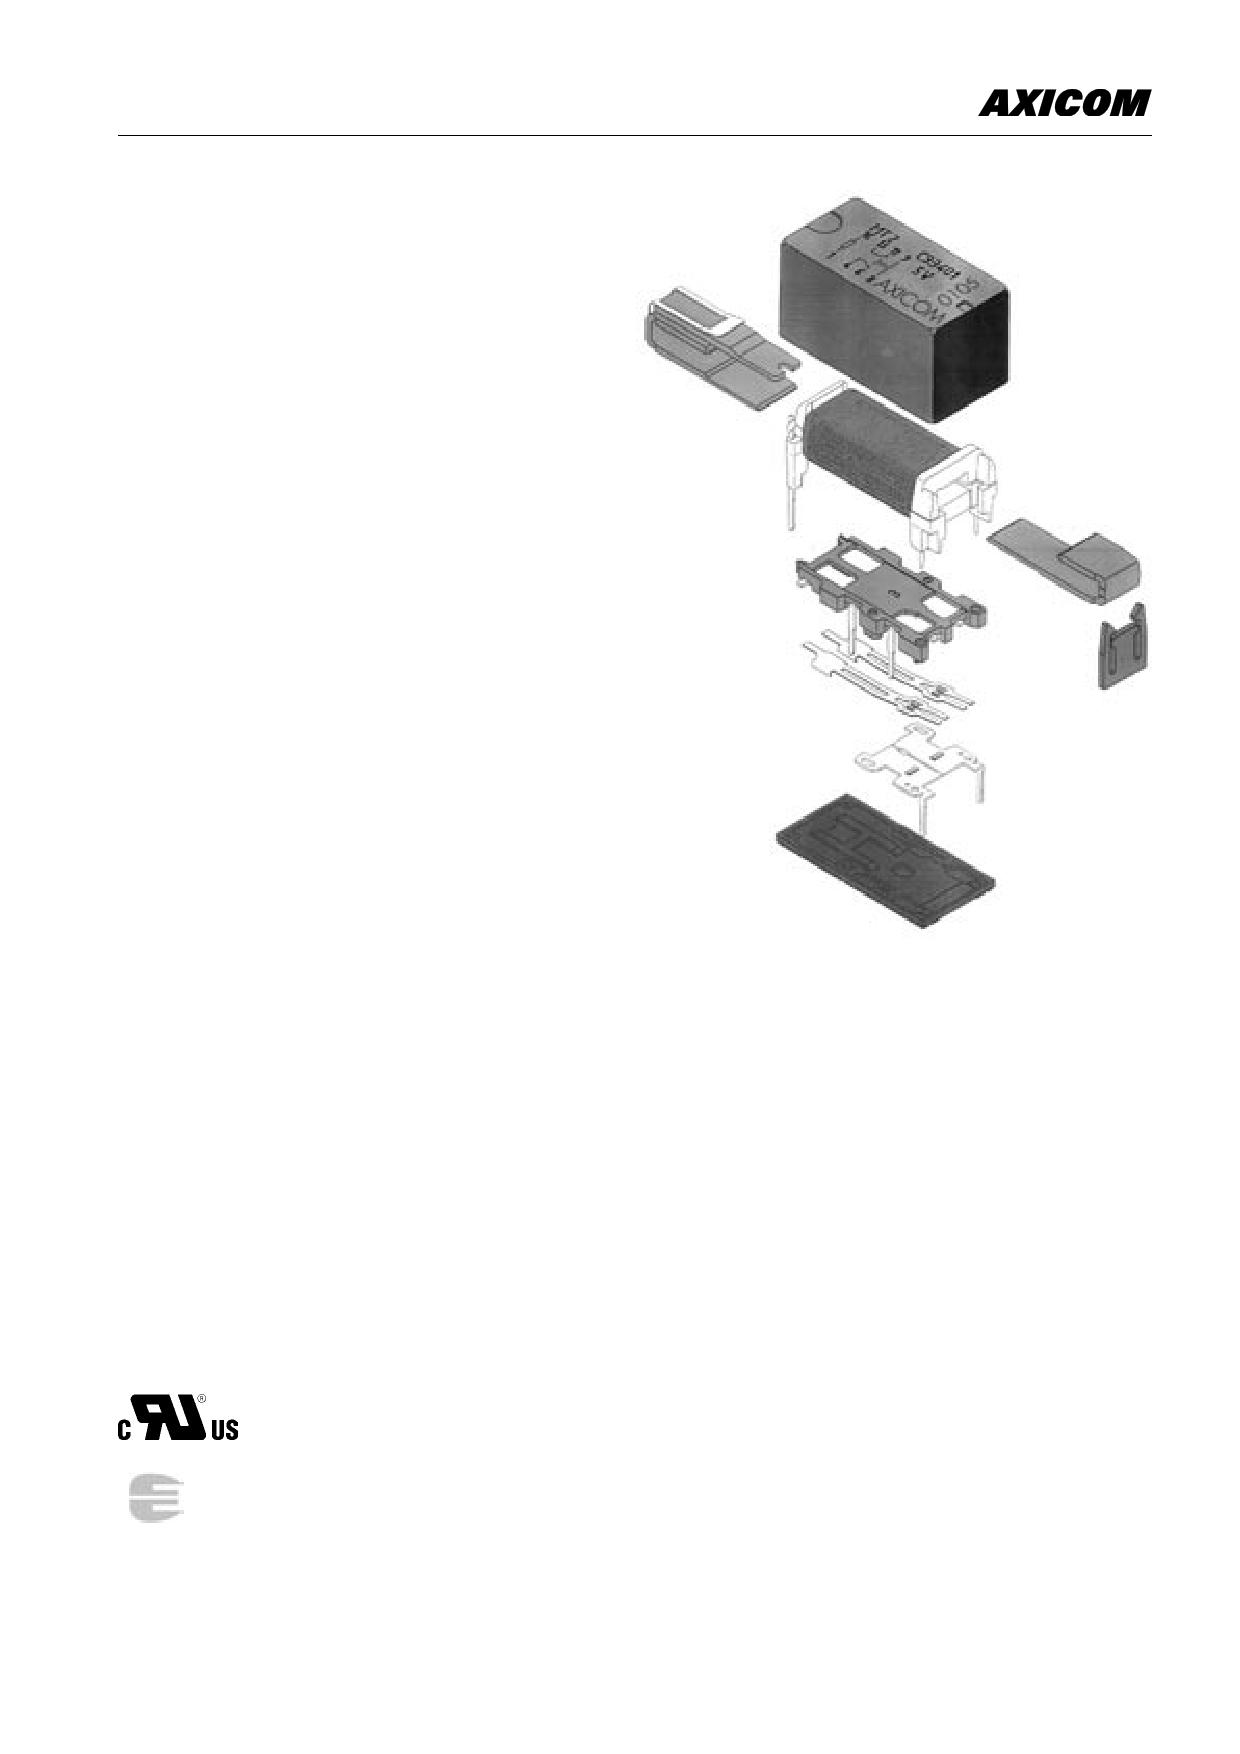 8-1462000-5 Даташит, Описание, Даташиты